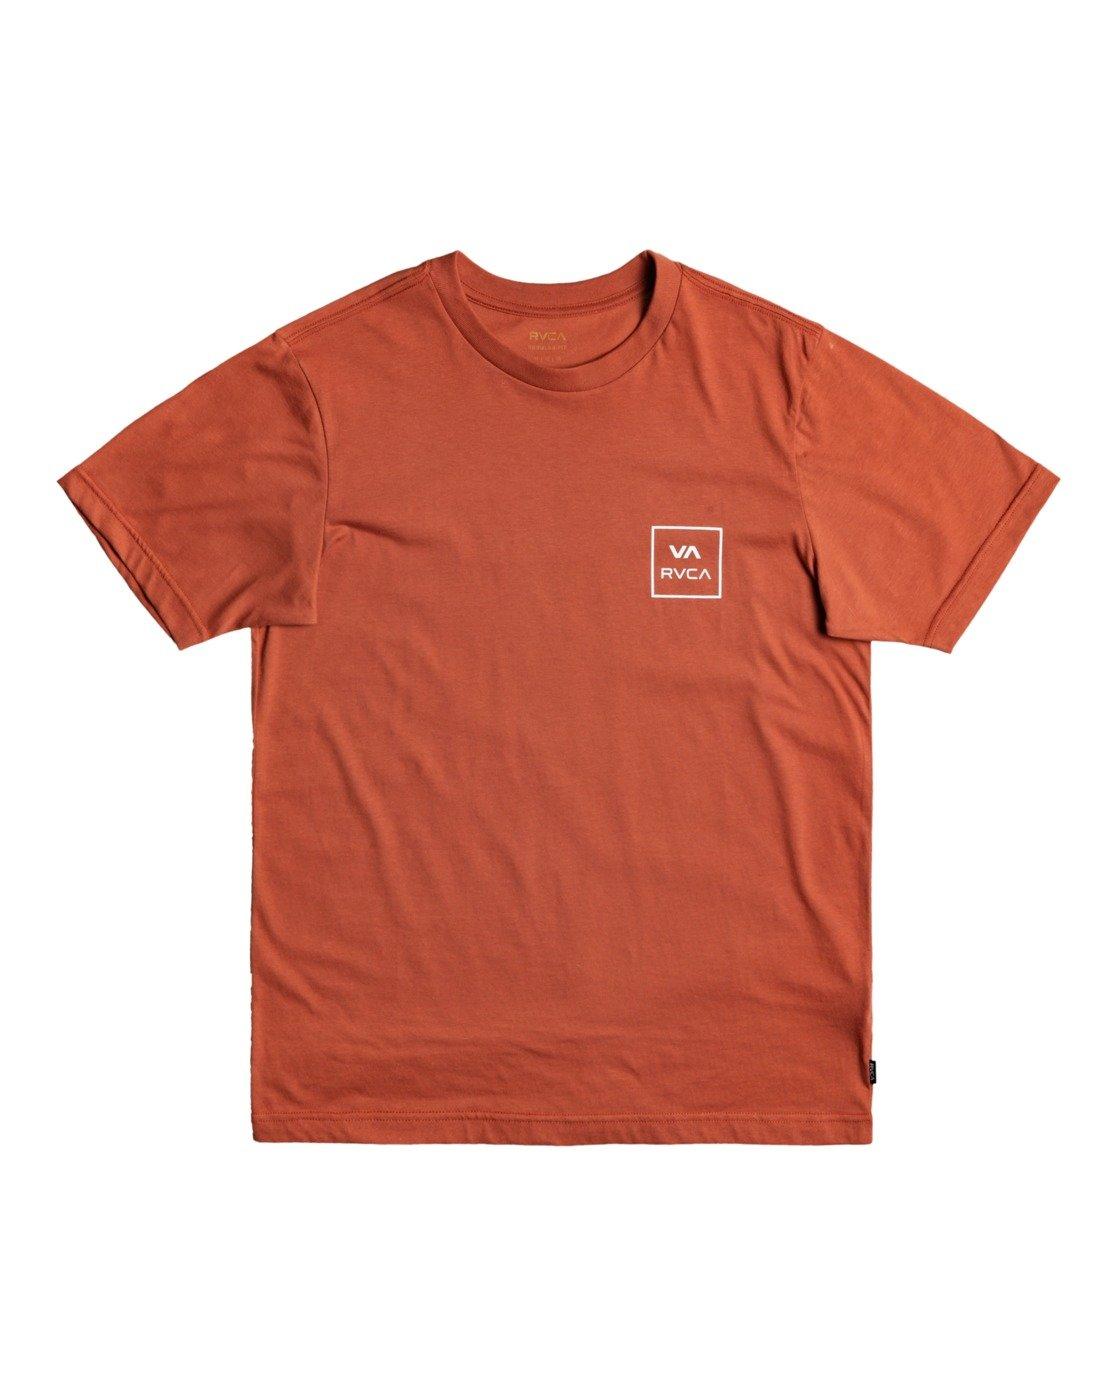 0 VA All The Ways - T-shirt pour Homme Orange W1SSSLRVP1 RVCA